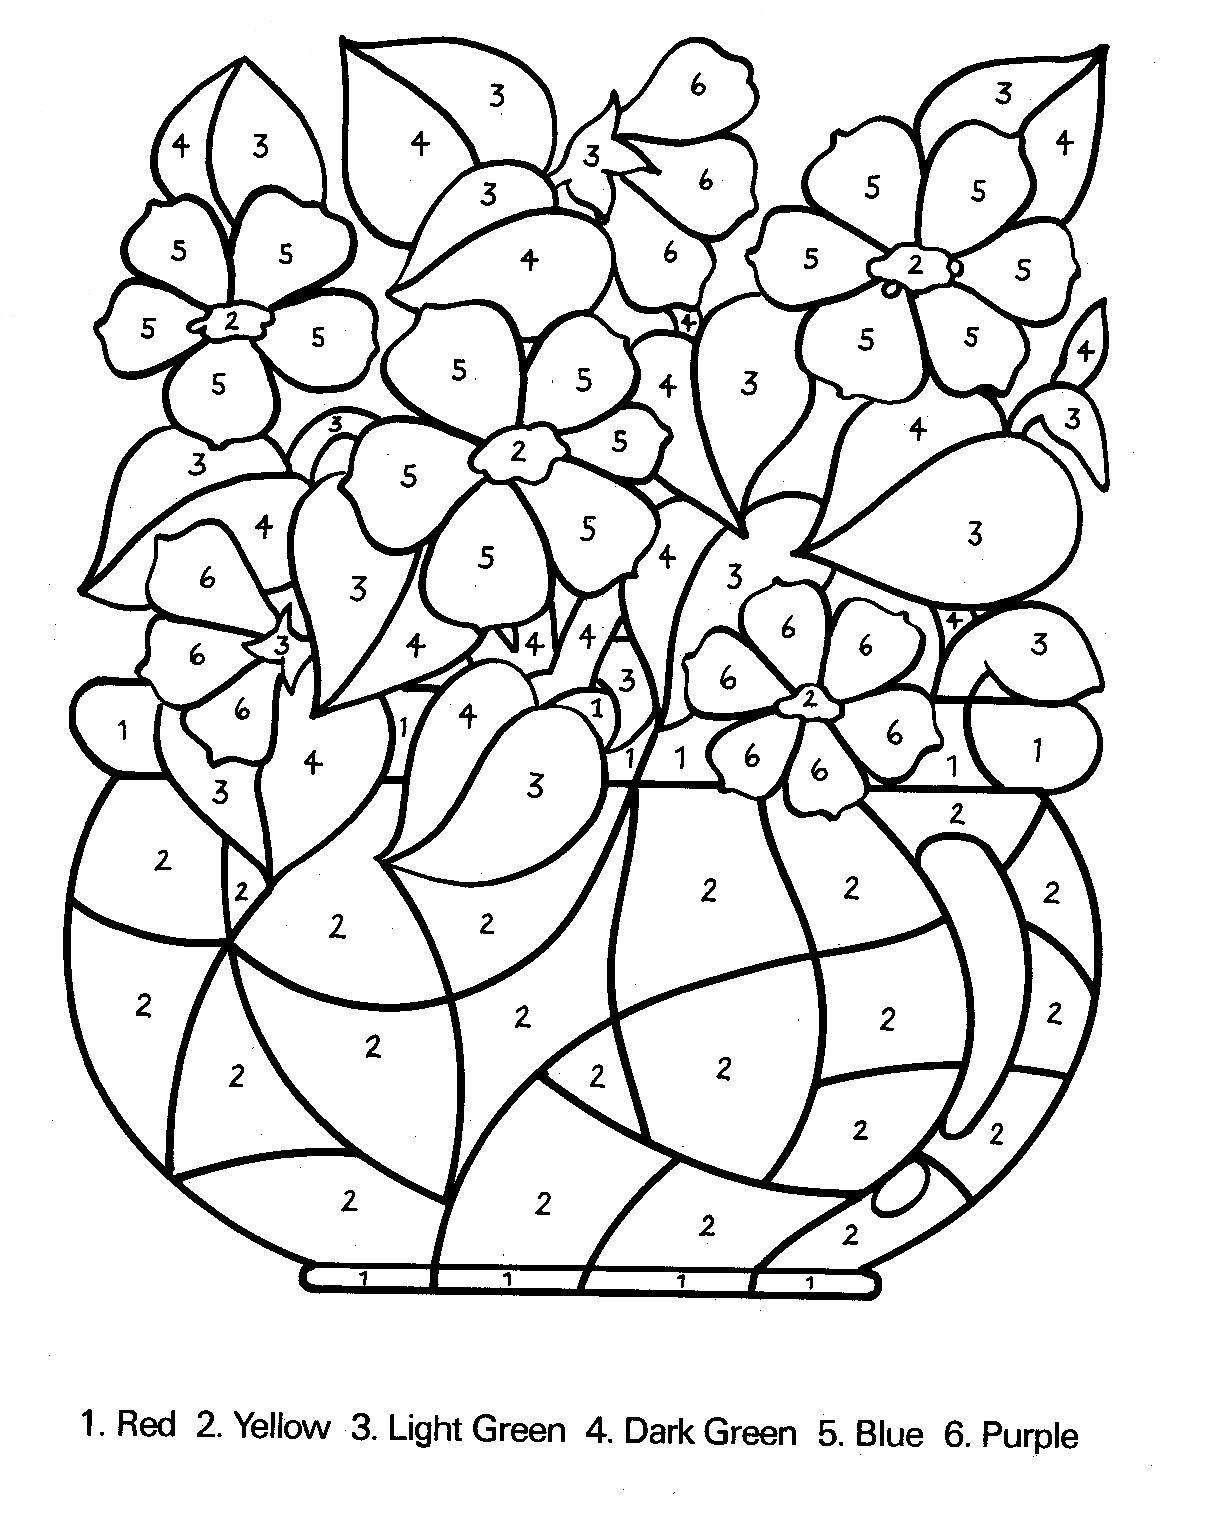 Number Flowers Coloring Sheets Digg Stumbleupon Del Icio Us